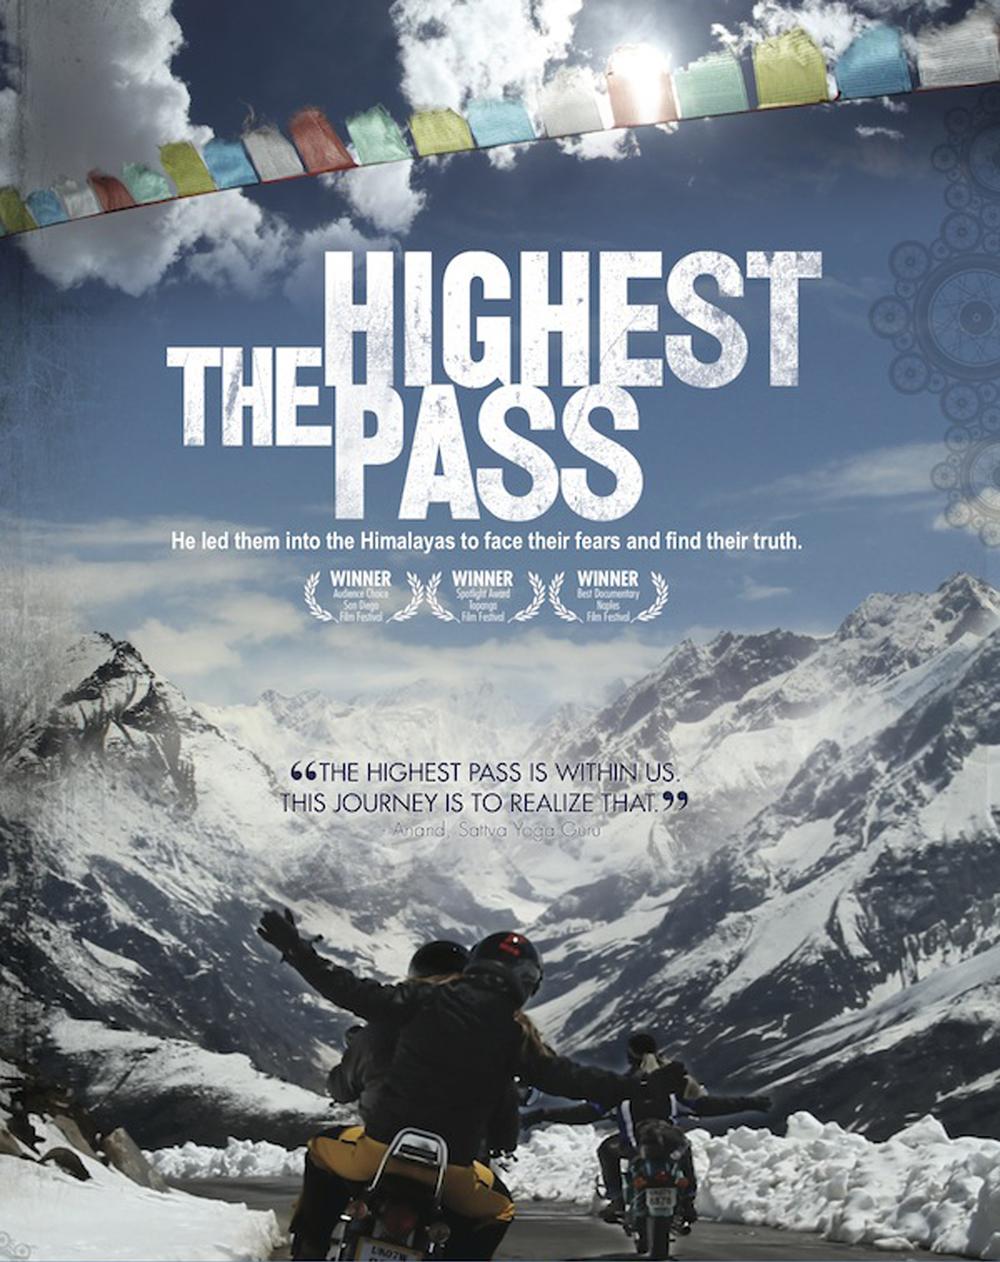 HighestPass_Poster_cropped.jpg